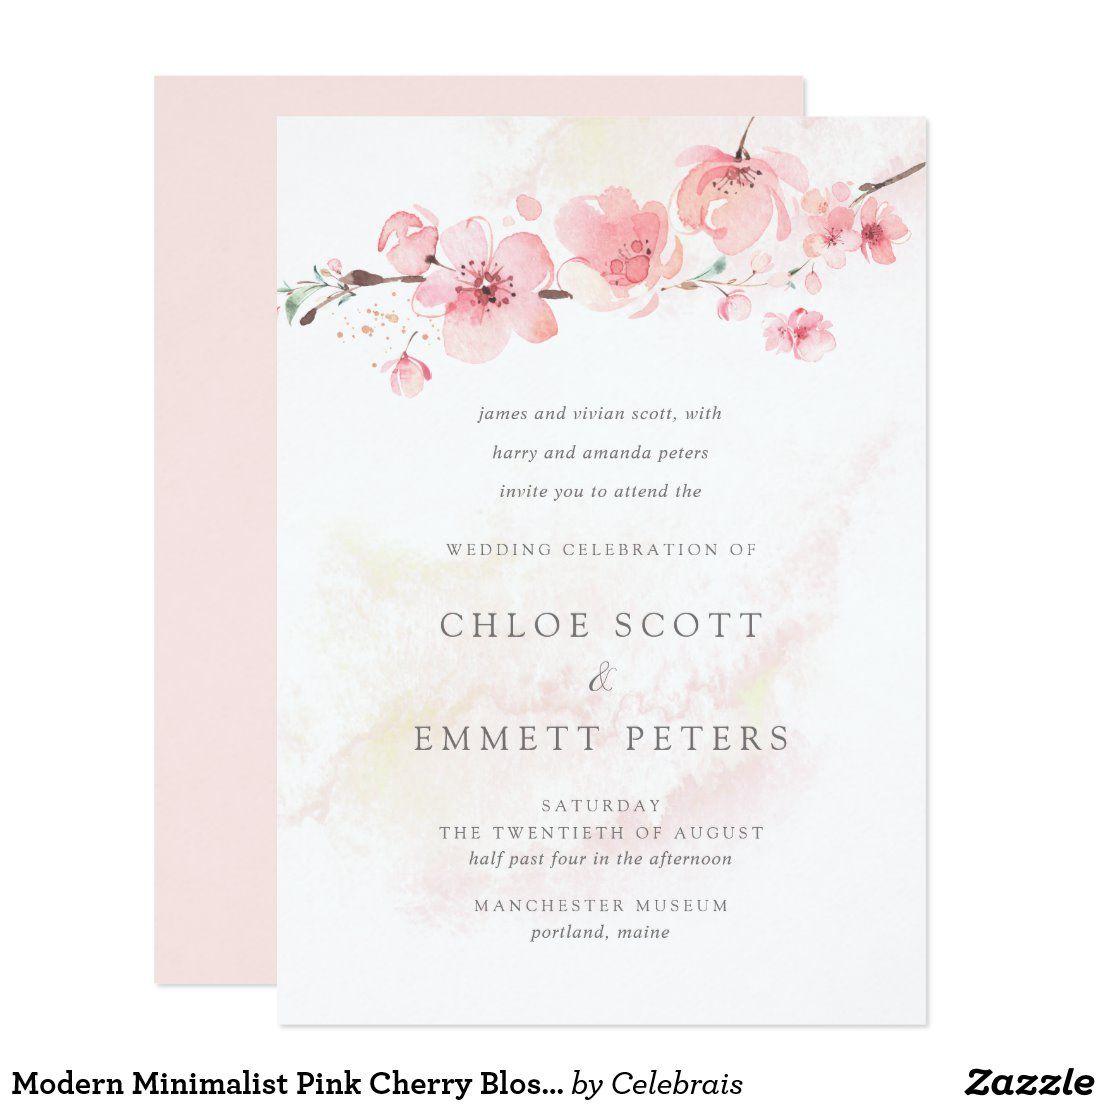 Modern Minimalist Pink Cherry Blossom Wedding Invitation Zazzle